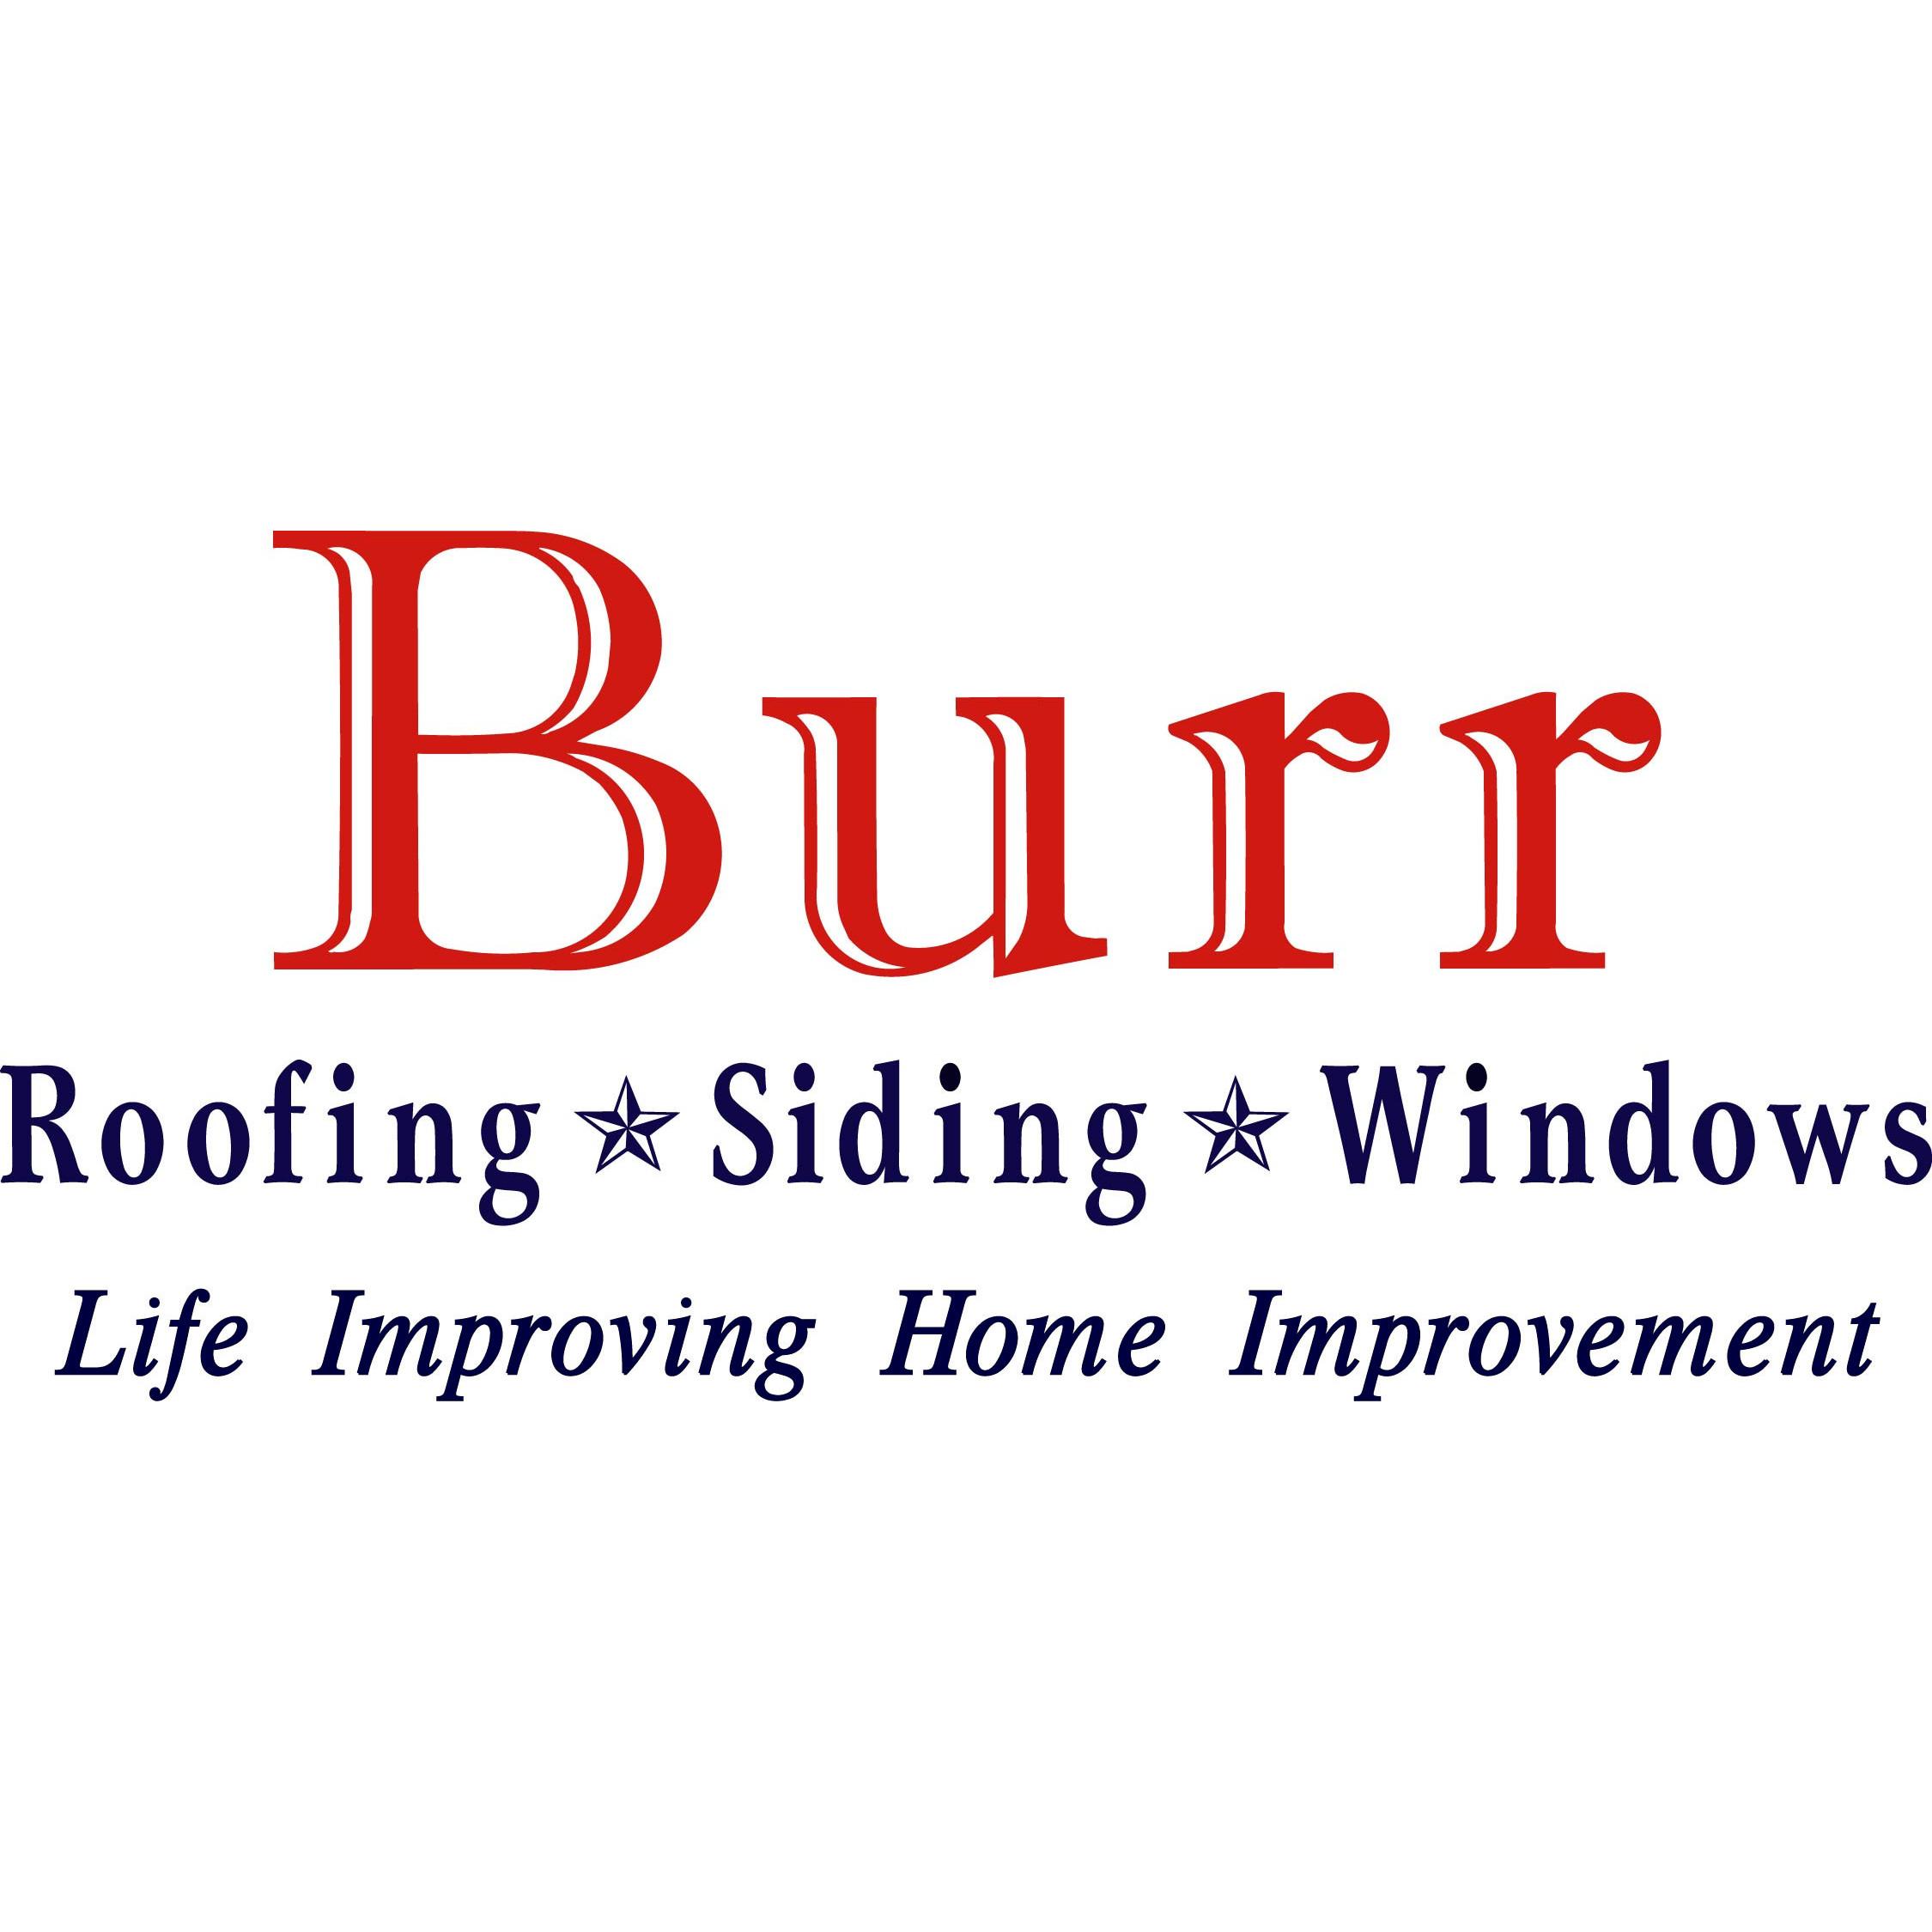 Burr Roofing, Siding, & Window Logo